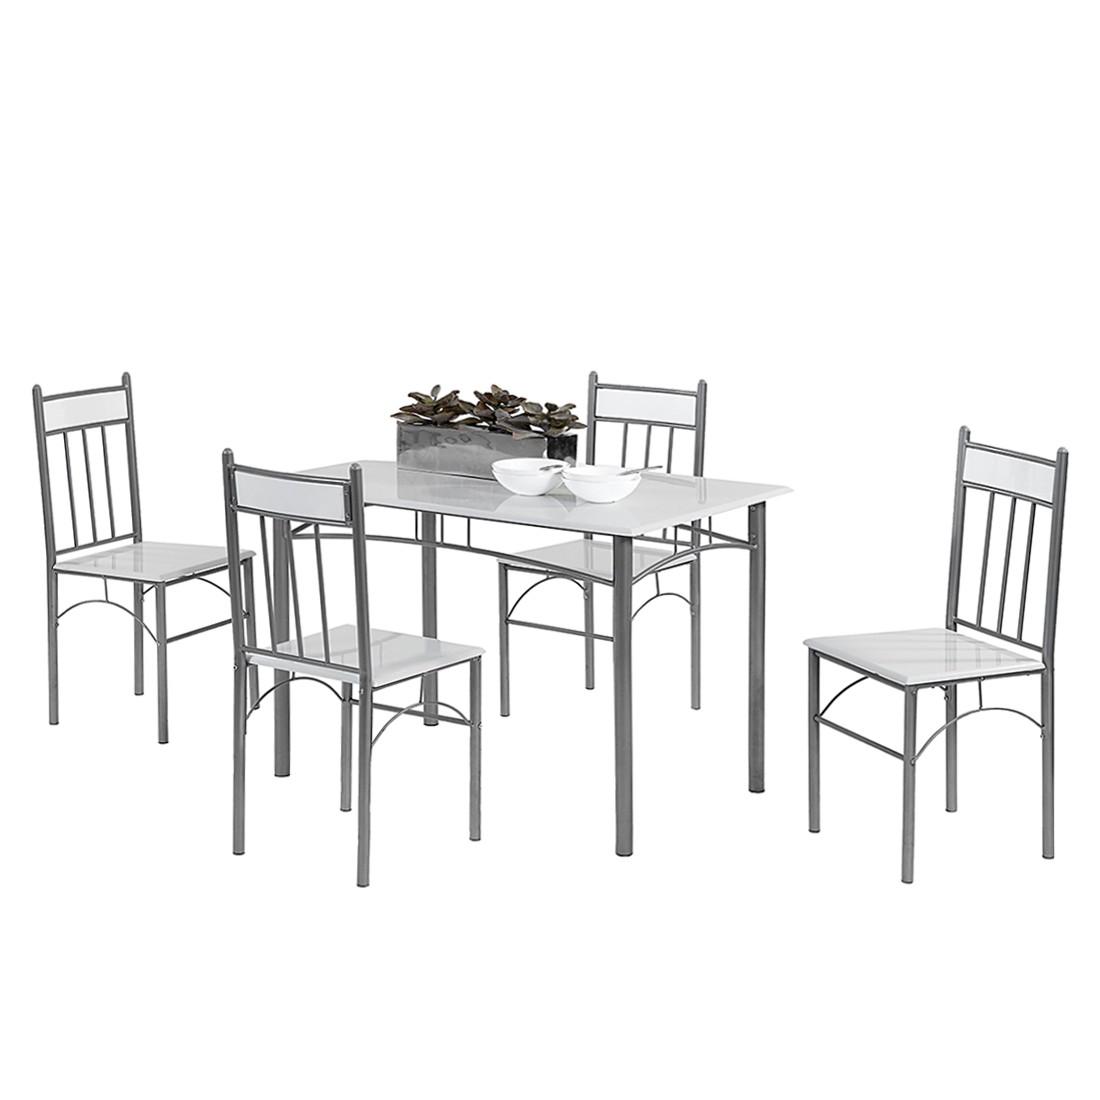 Essgruppe Star (5-teilig) – Hochglanz Weiß/Alu lackiert, Home Design günstig